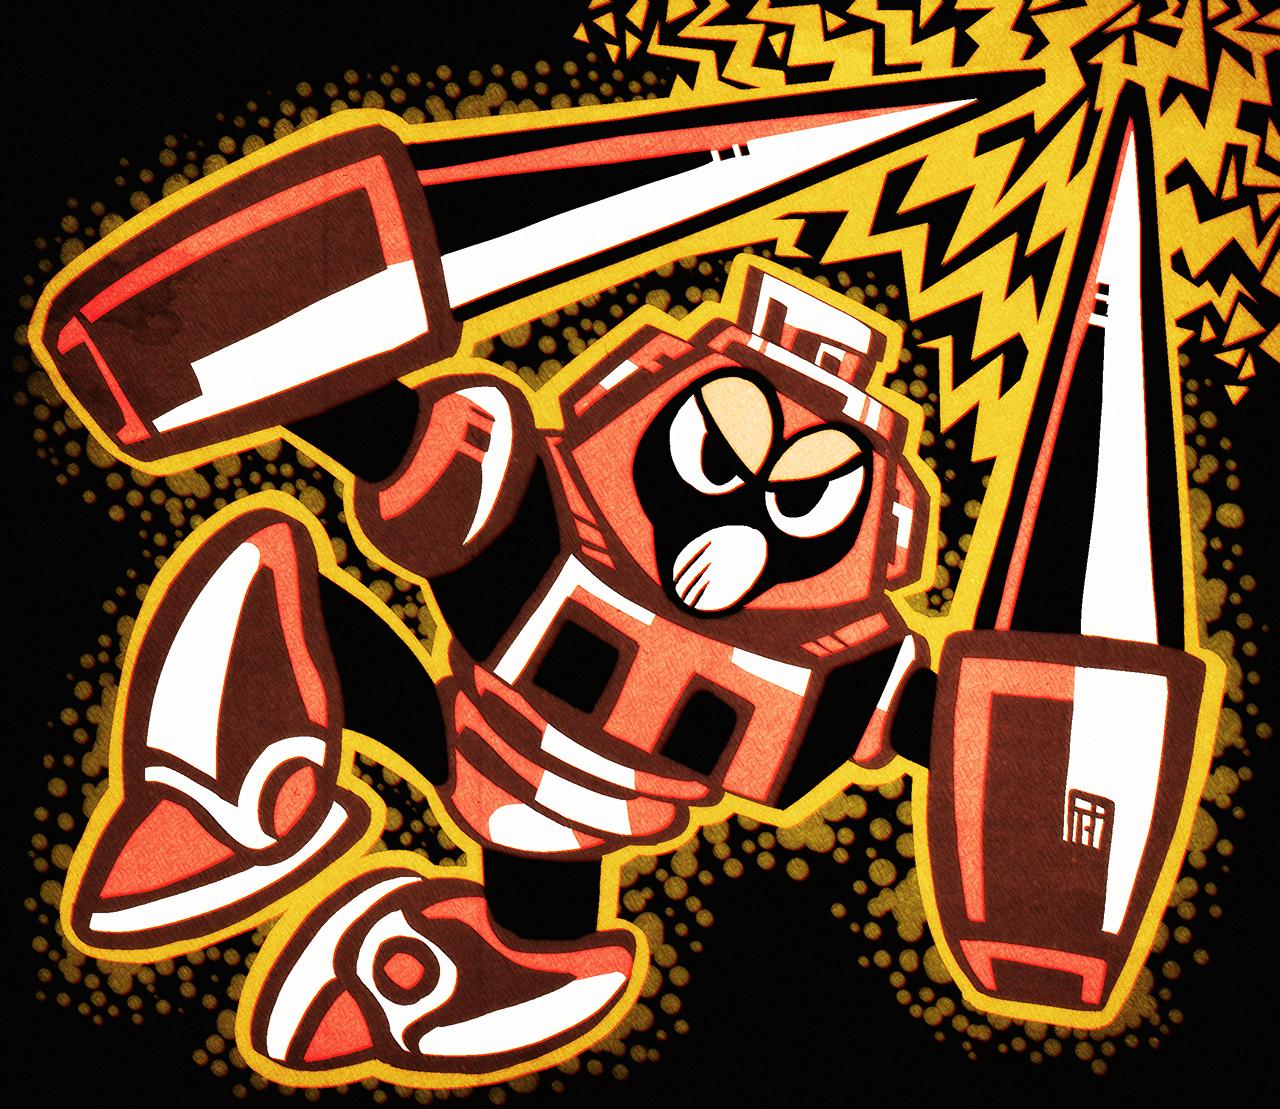 NES Spark Man